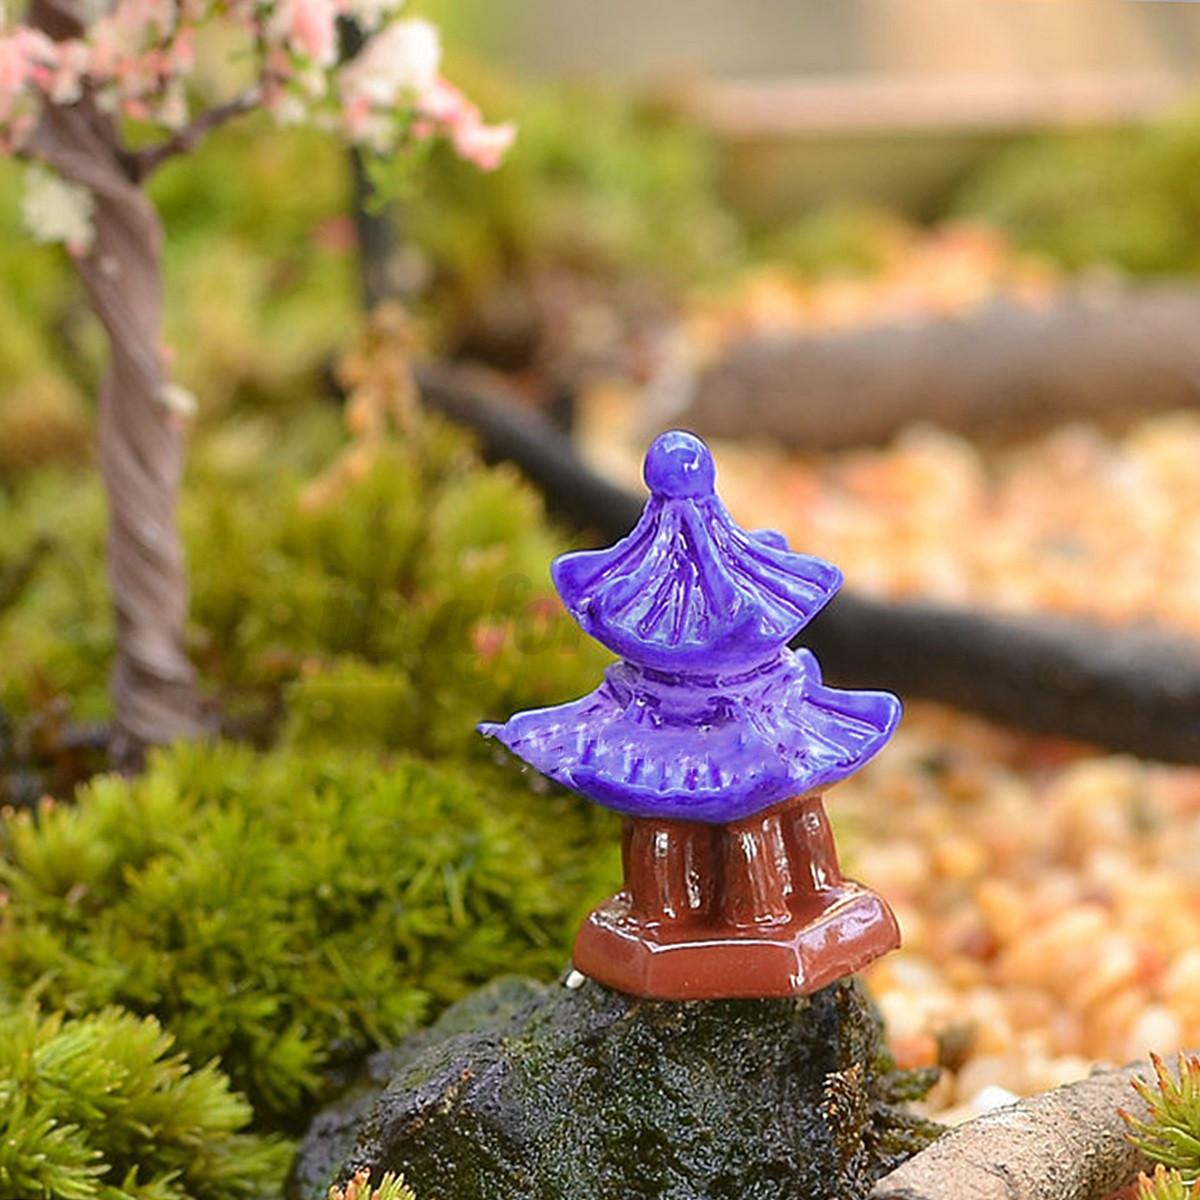 Diy fairy garden miniature house figurine craft micro for Diy miniature garden accessories